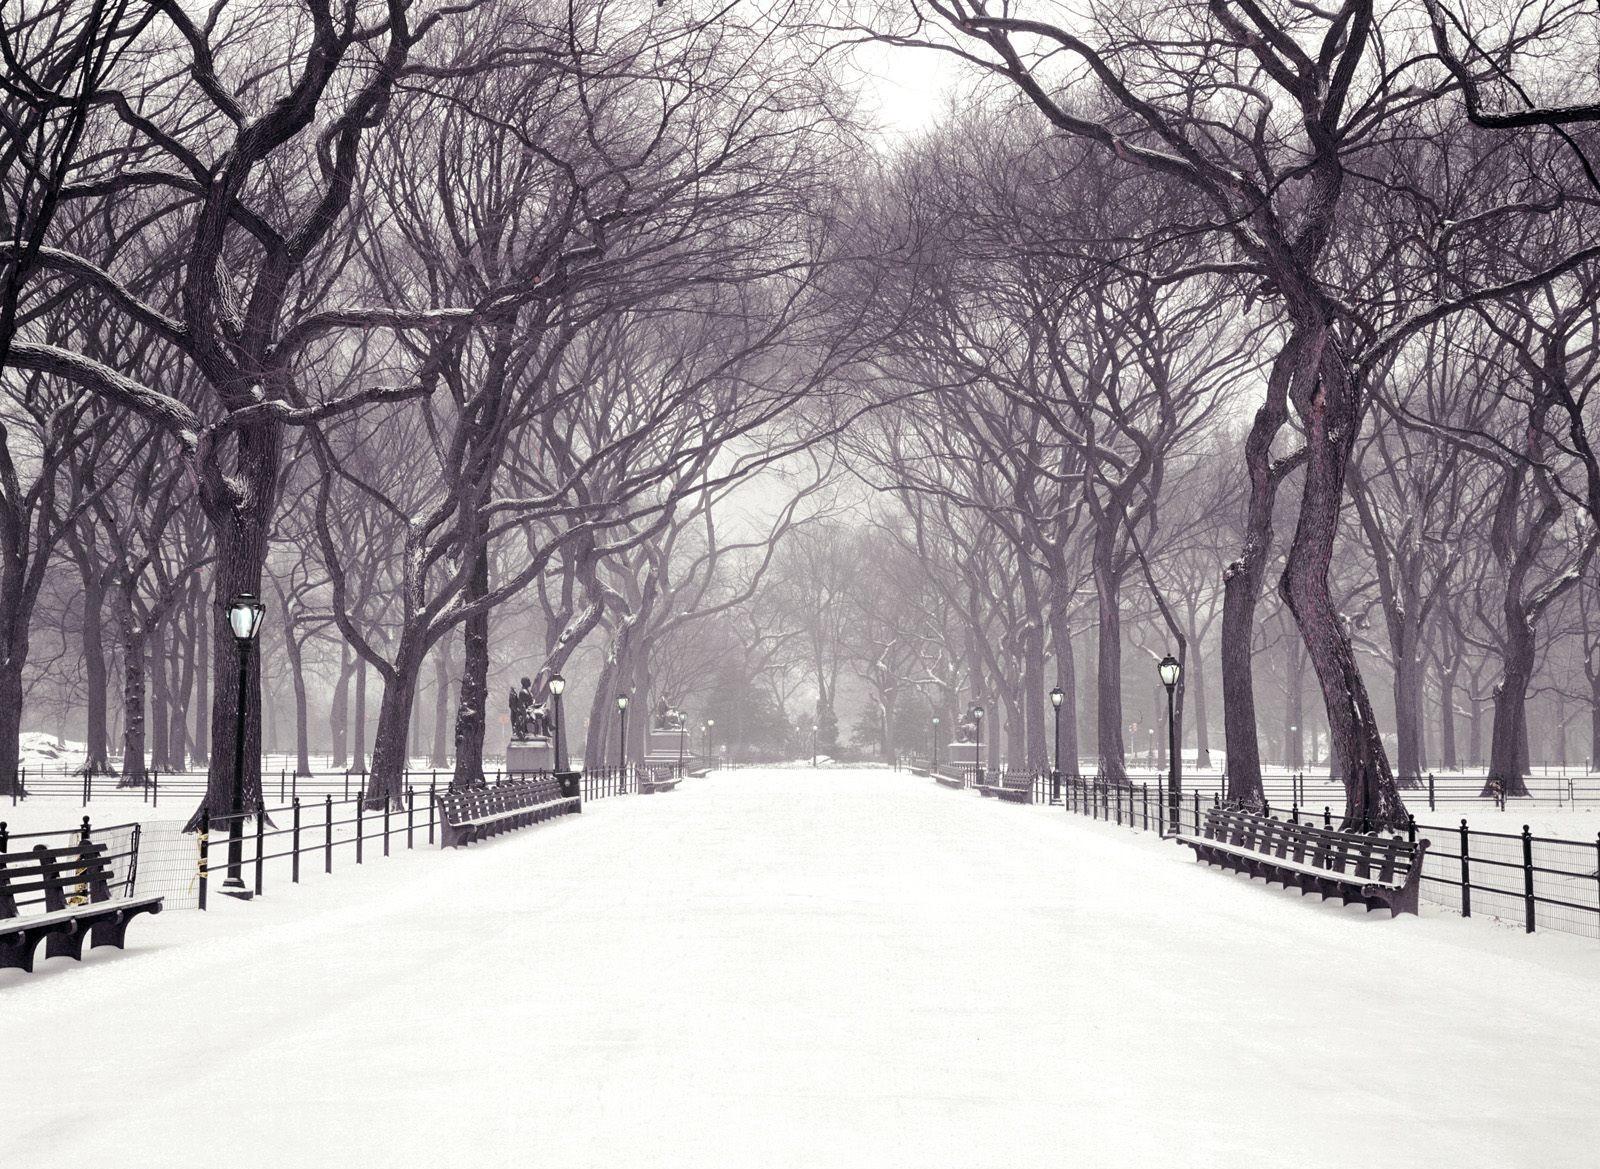 Validation/WinterFall/winter8.jpg